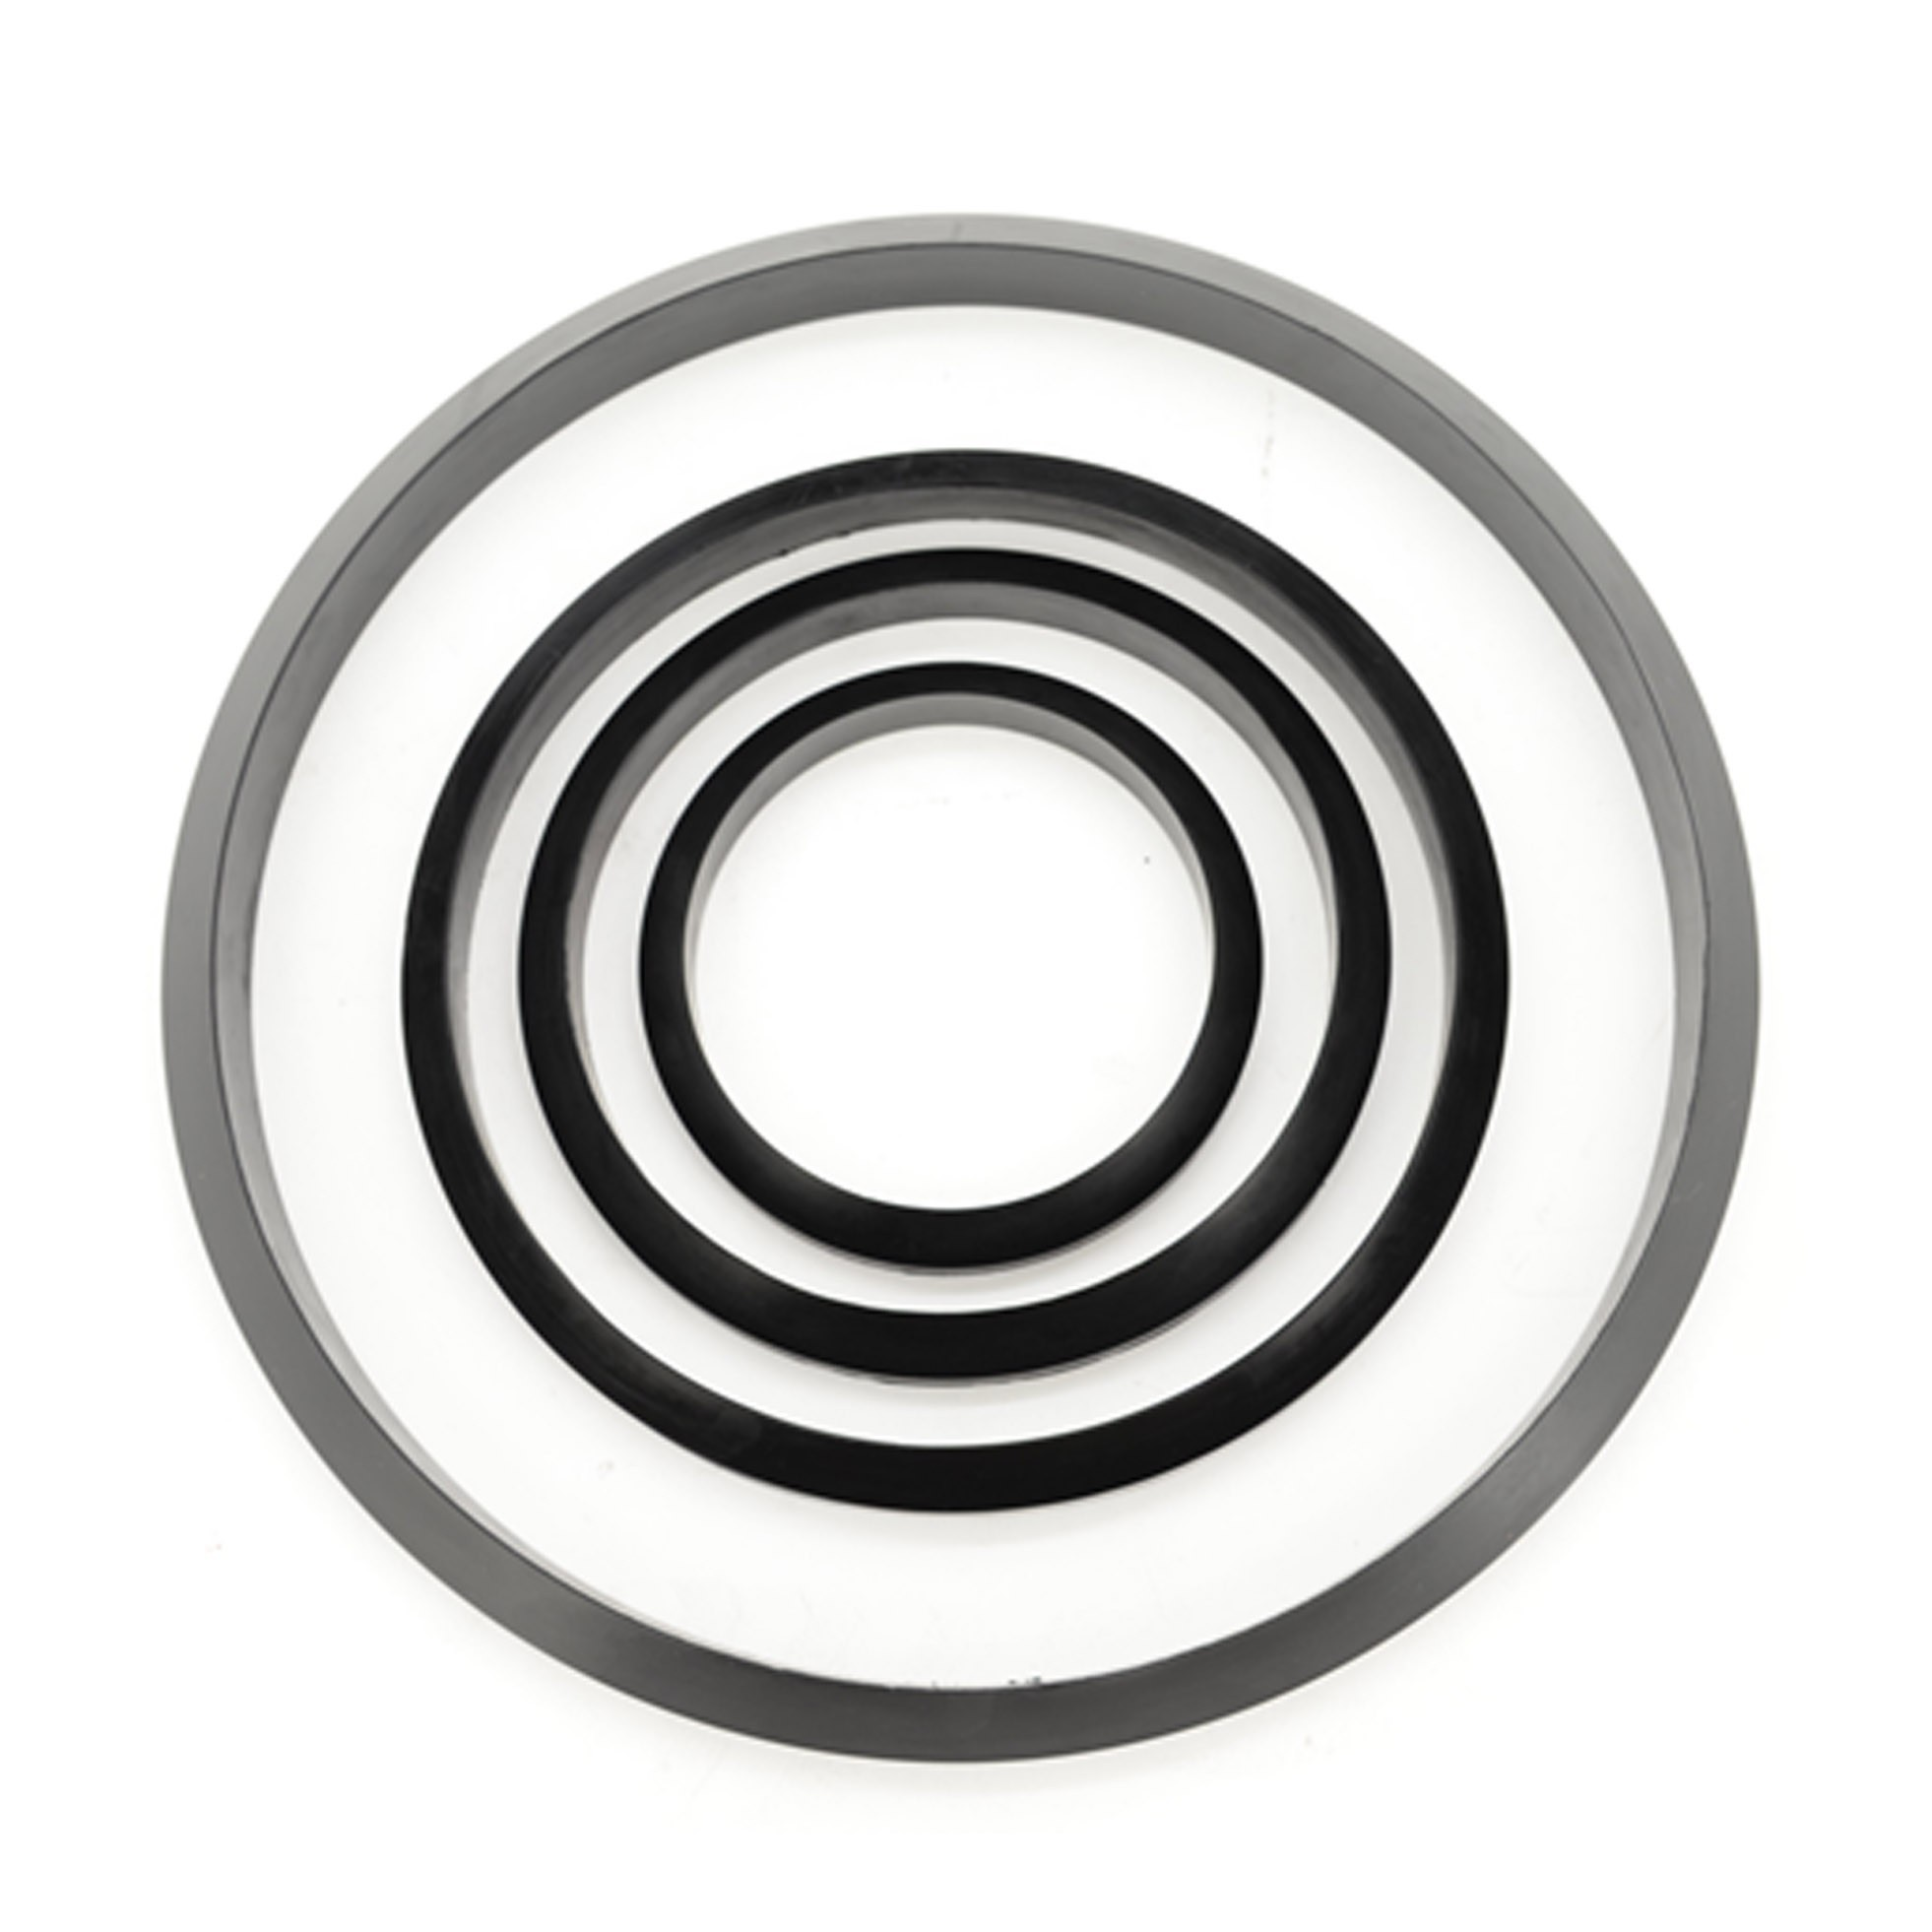 Rubber ring PVC